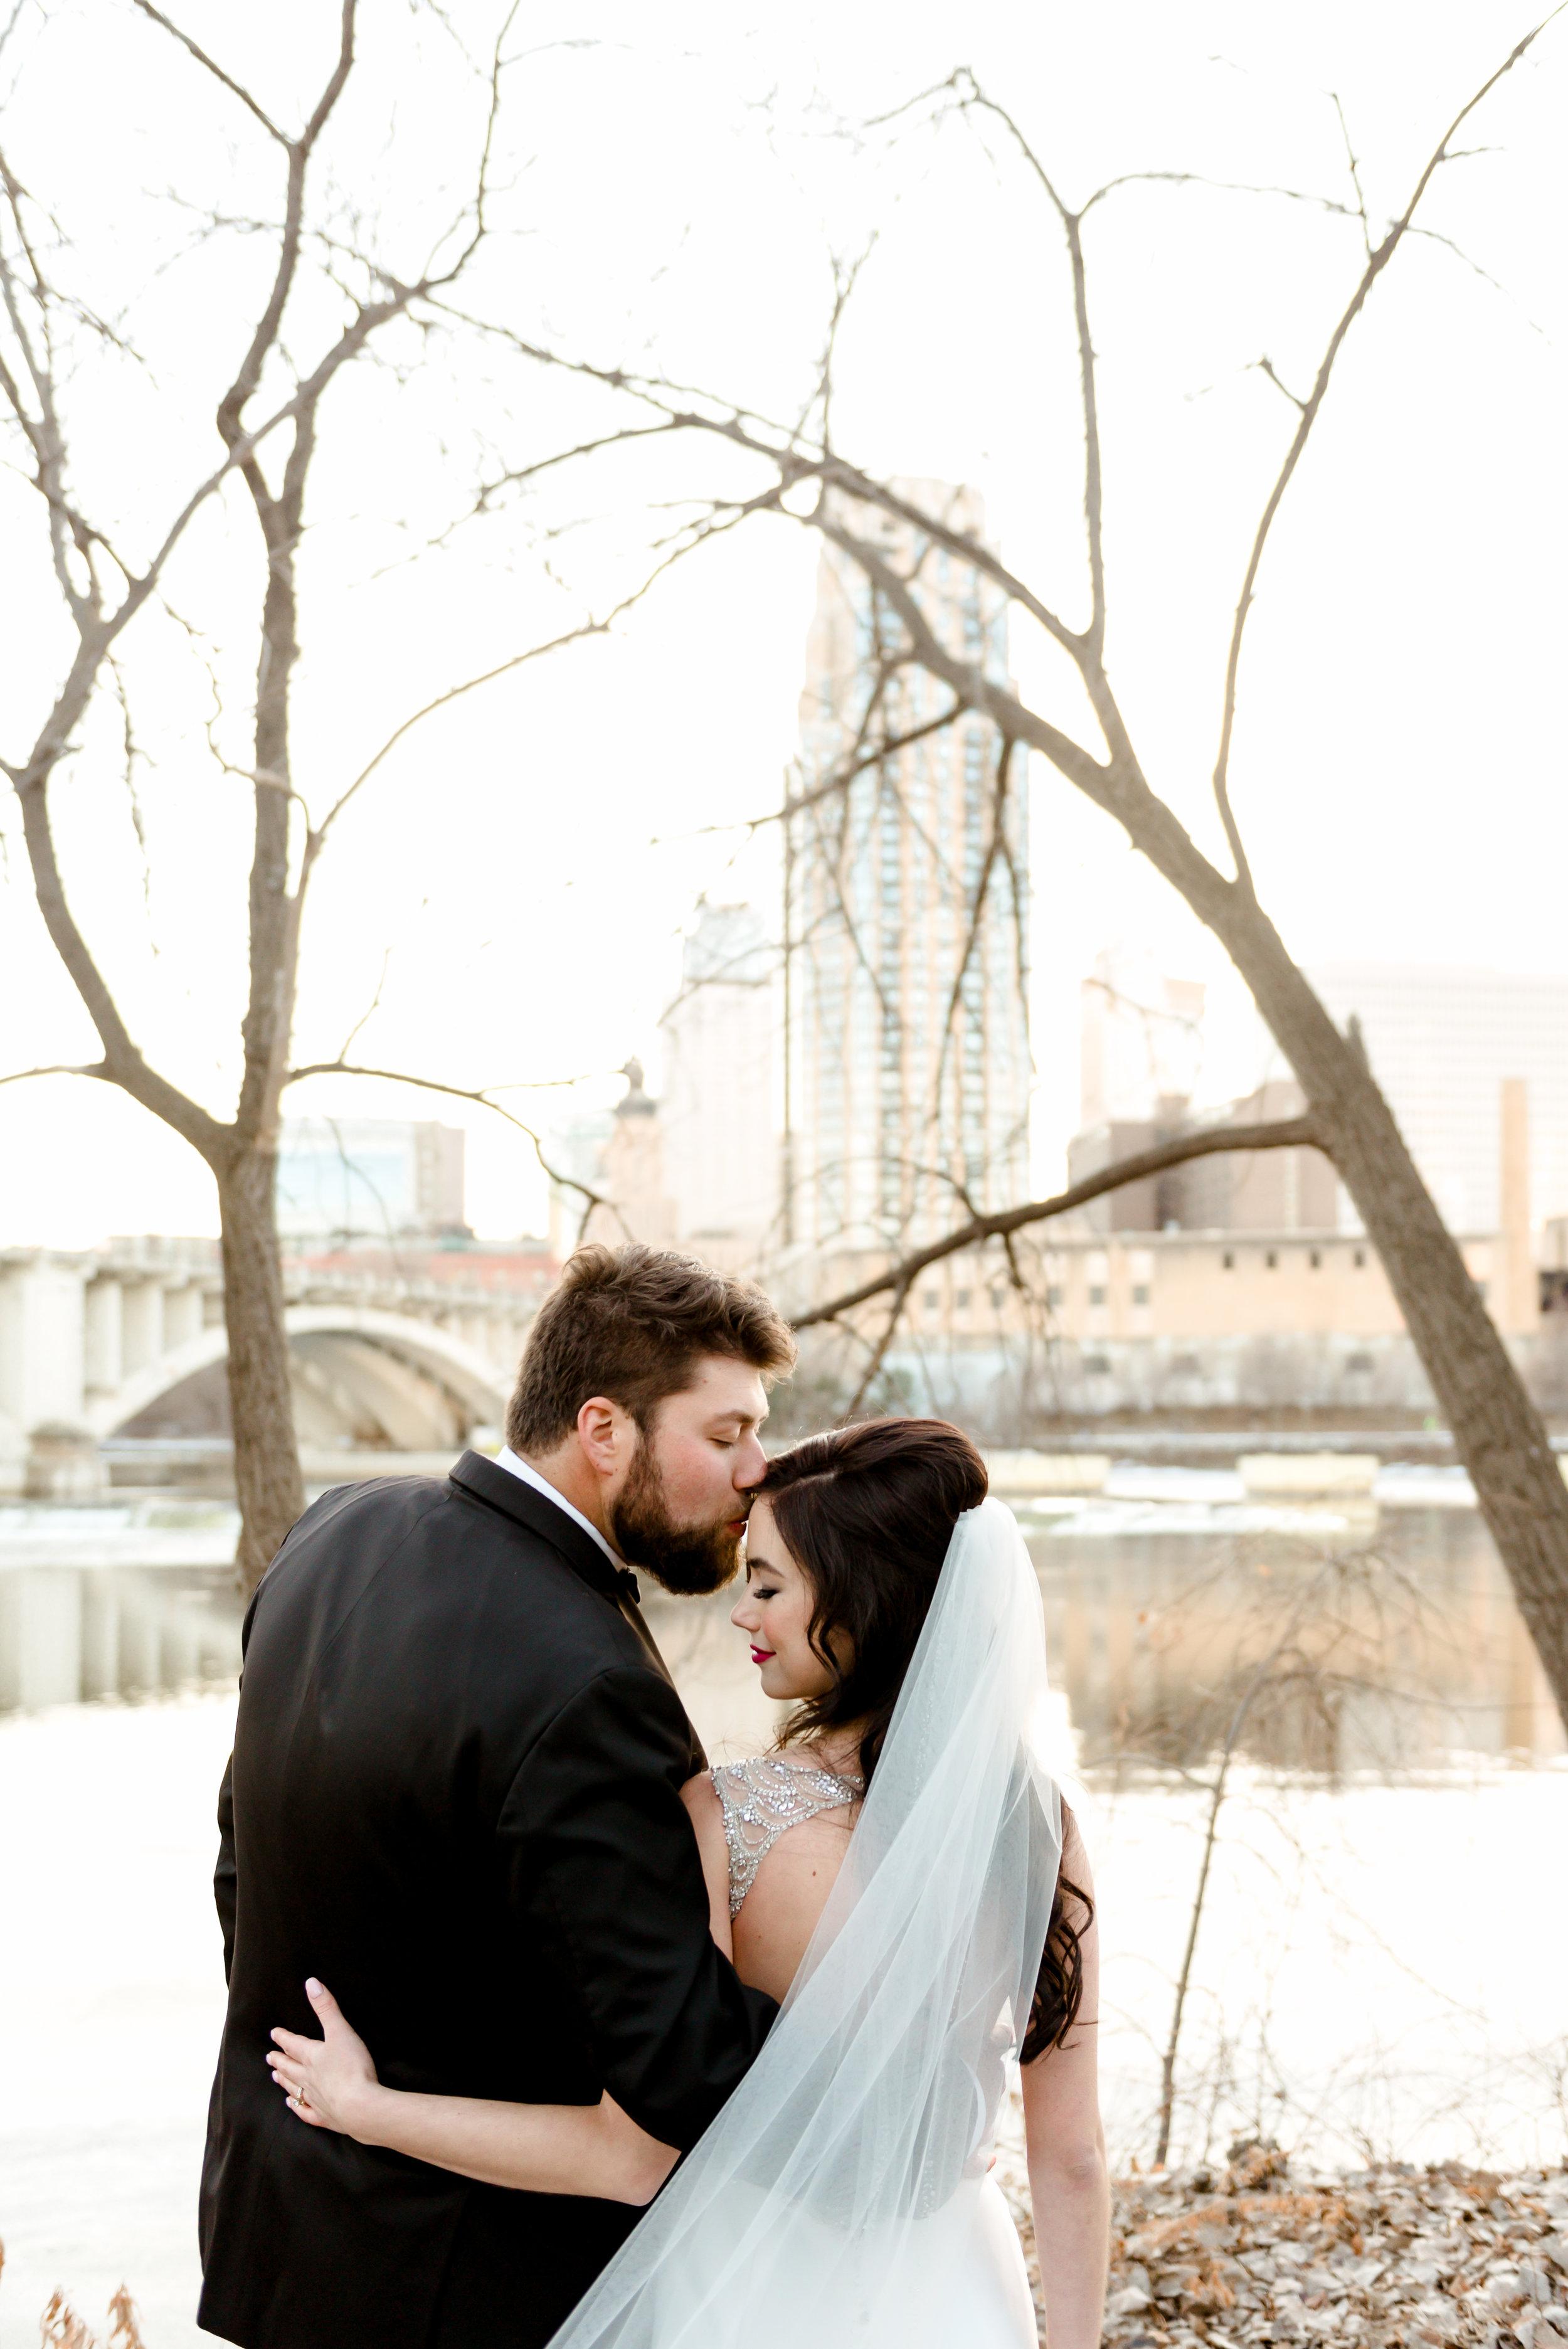 Olivia and Anthony - Nicollet Island Pavilion Wedding - Bride + Groom-217.jpg